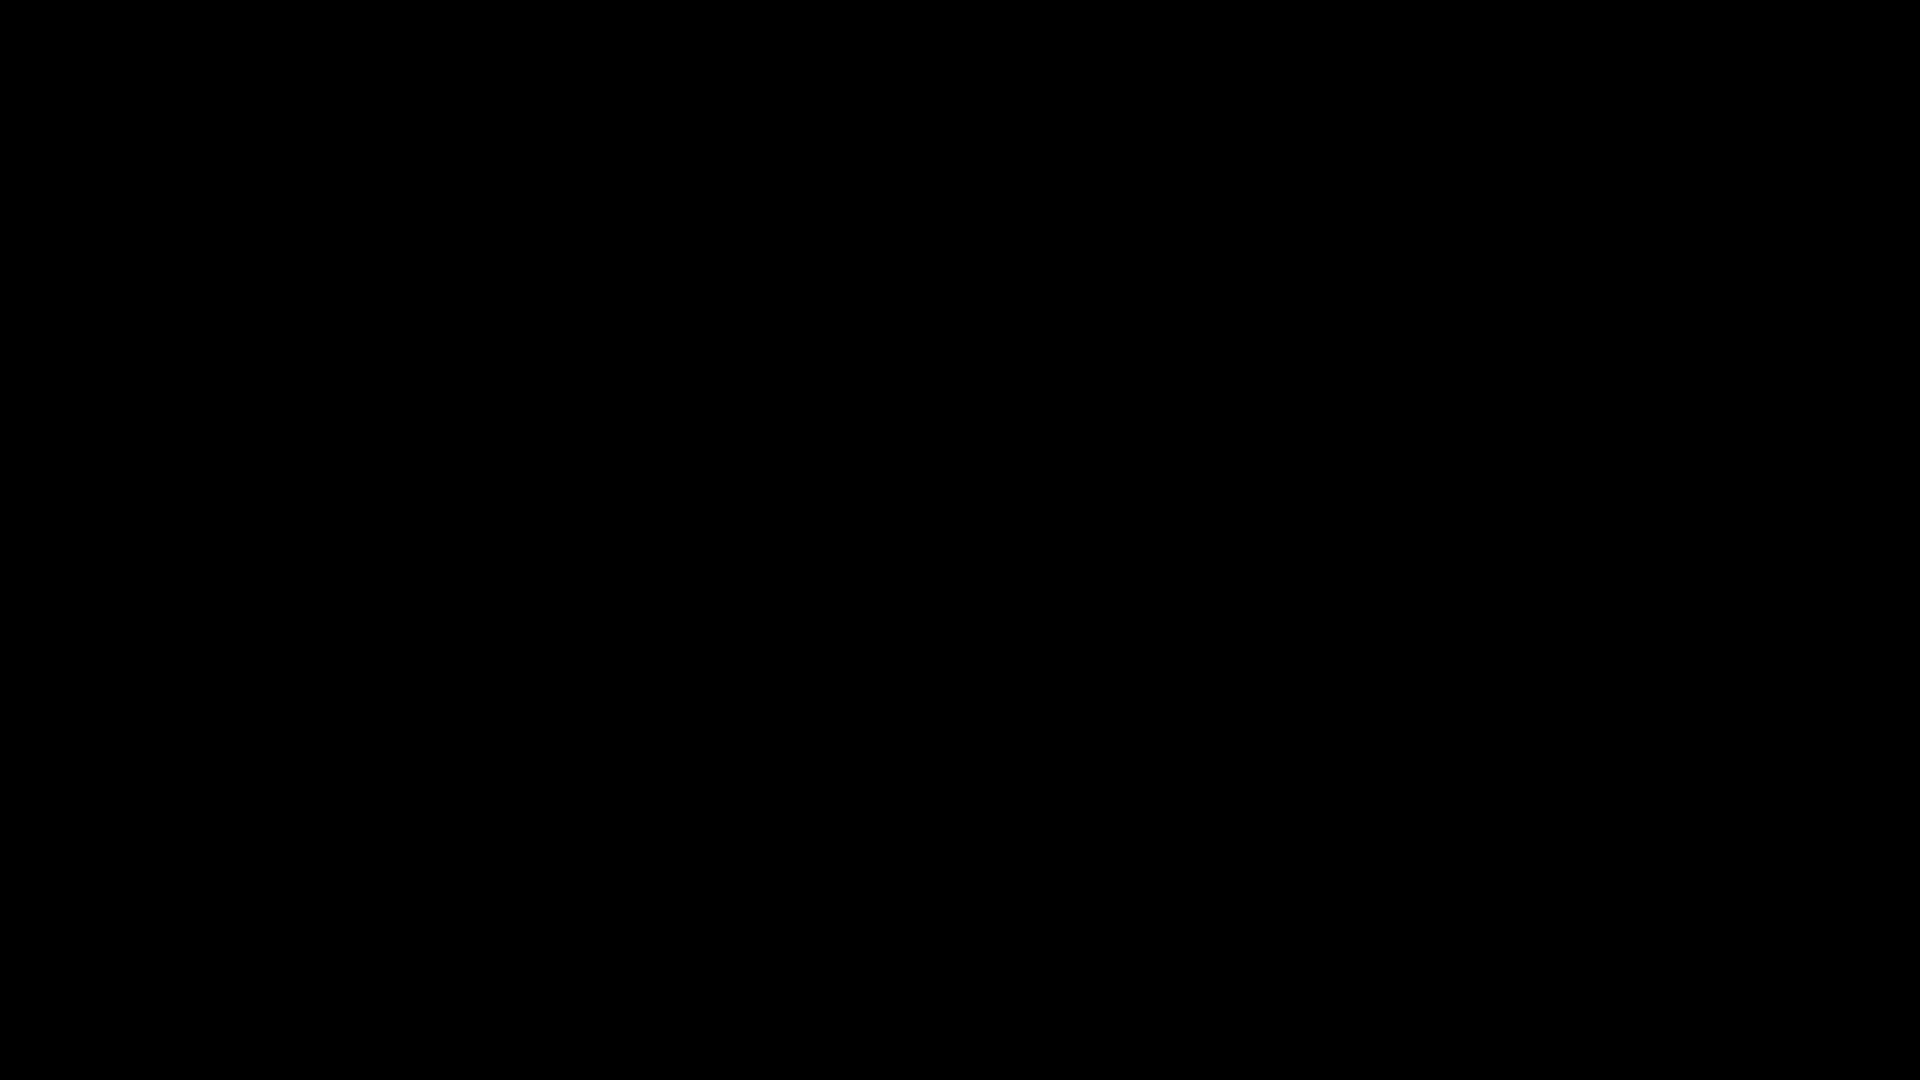 https://eqoxdgod6do.exactdn.com/wp-content/uploads/2021/03/AdobeStock_230564254-scaled.jpeg?strip=all&lossy=1&w=1920&ssl=1